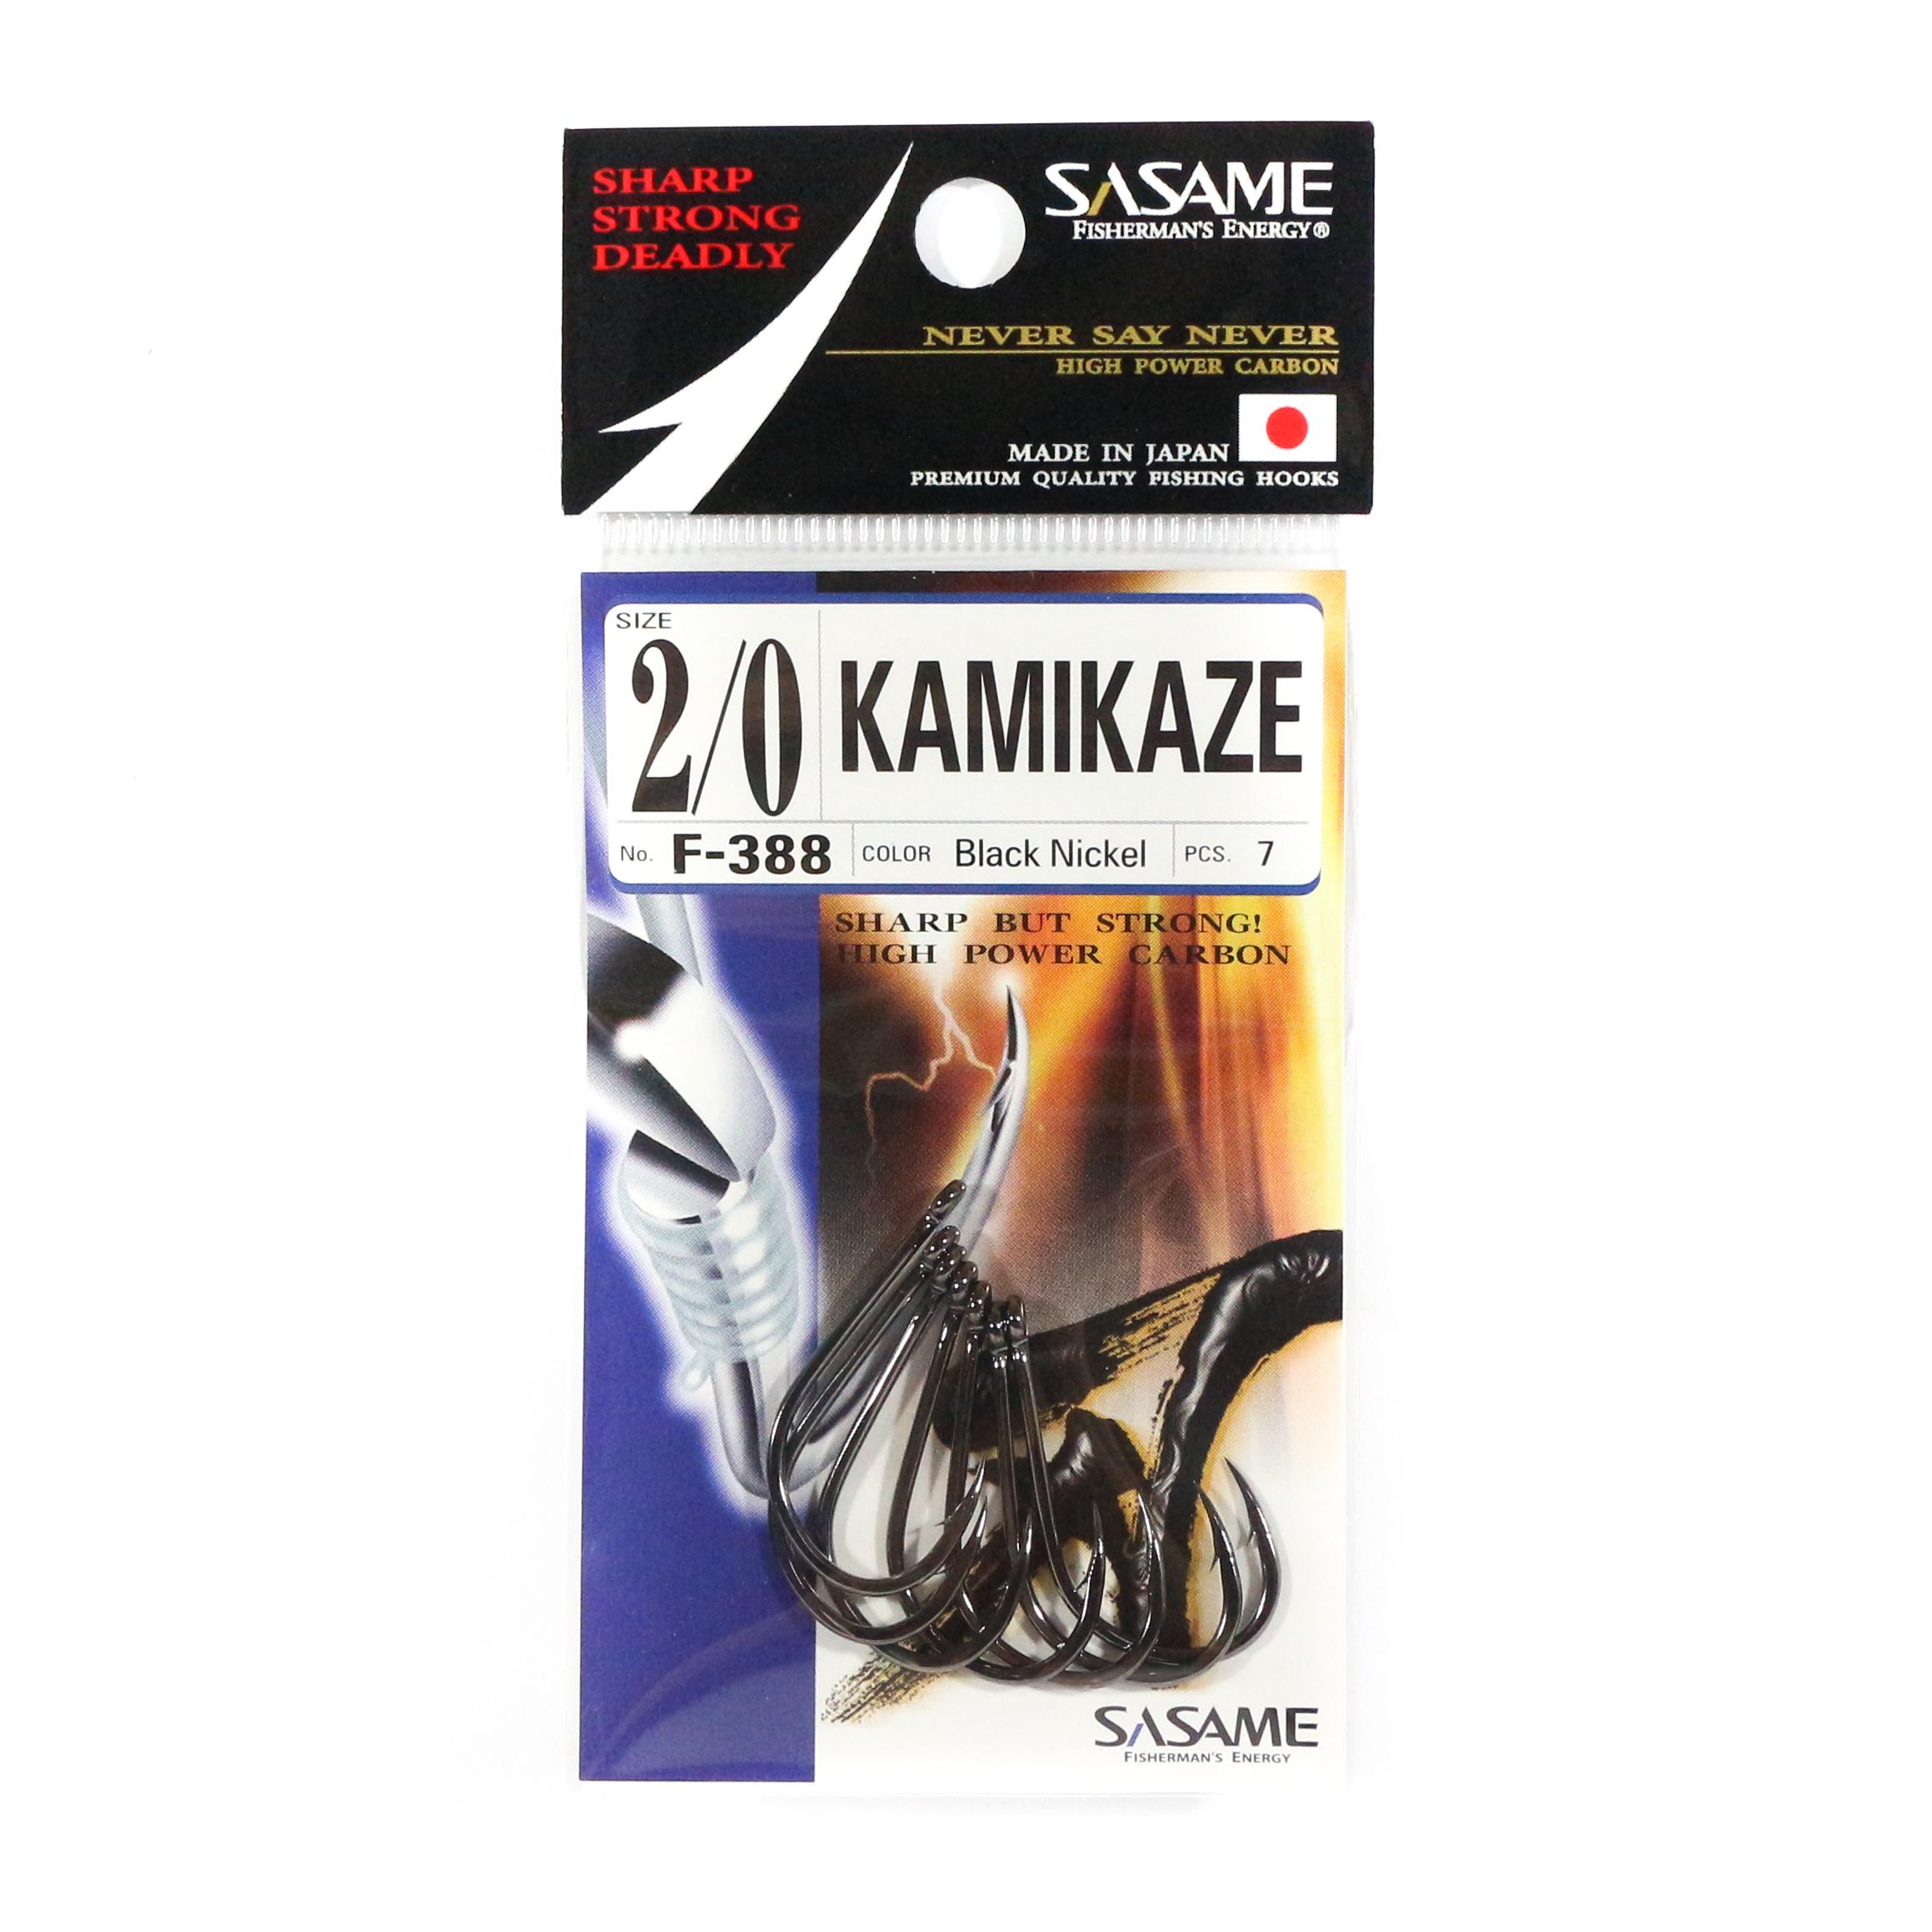 Sasame F-388 Kamikaze Straight Shank Offset Hook Size 2/0 (4866)